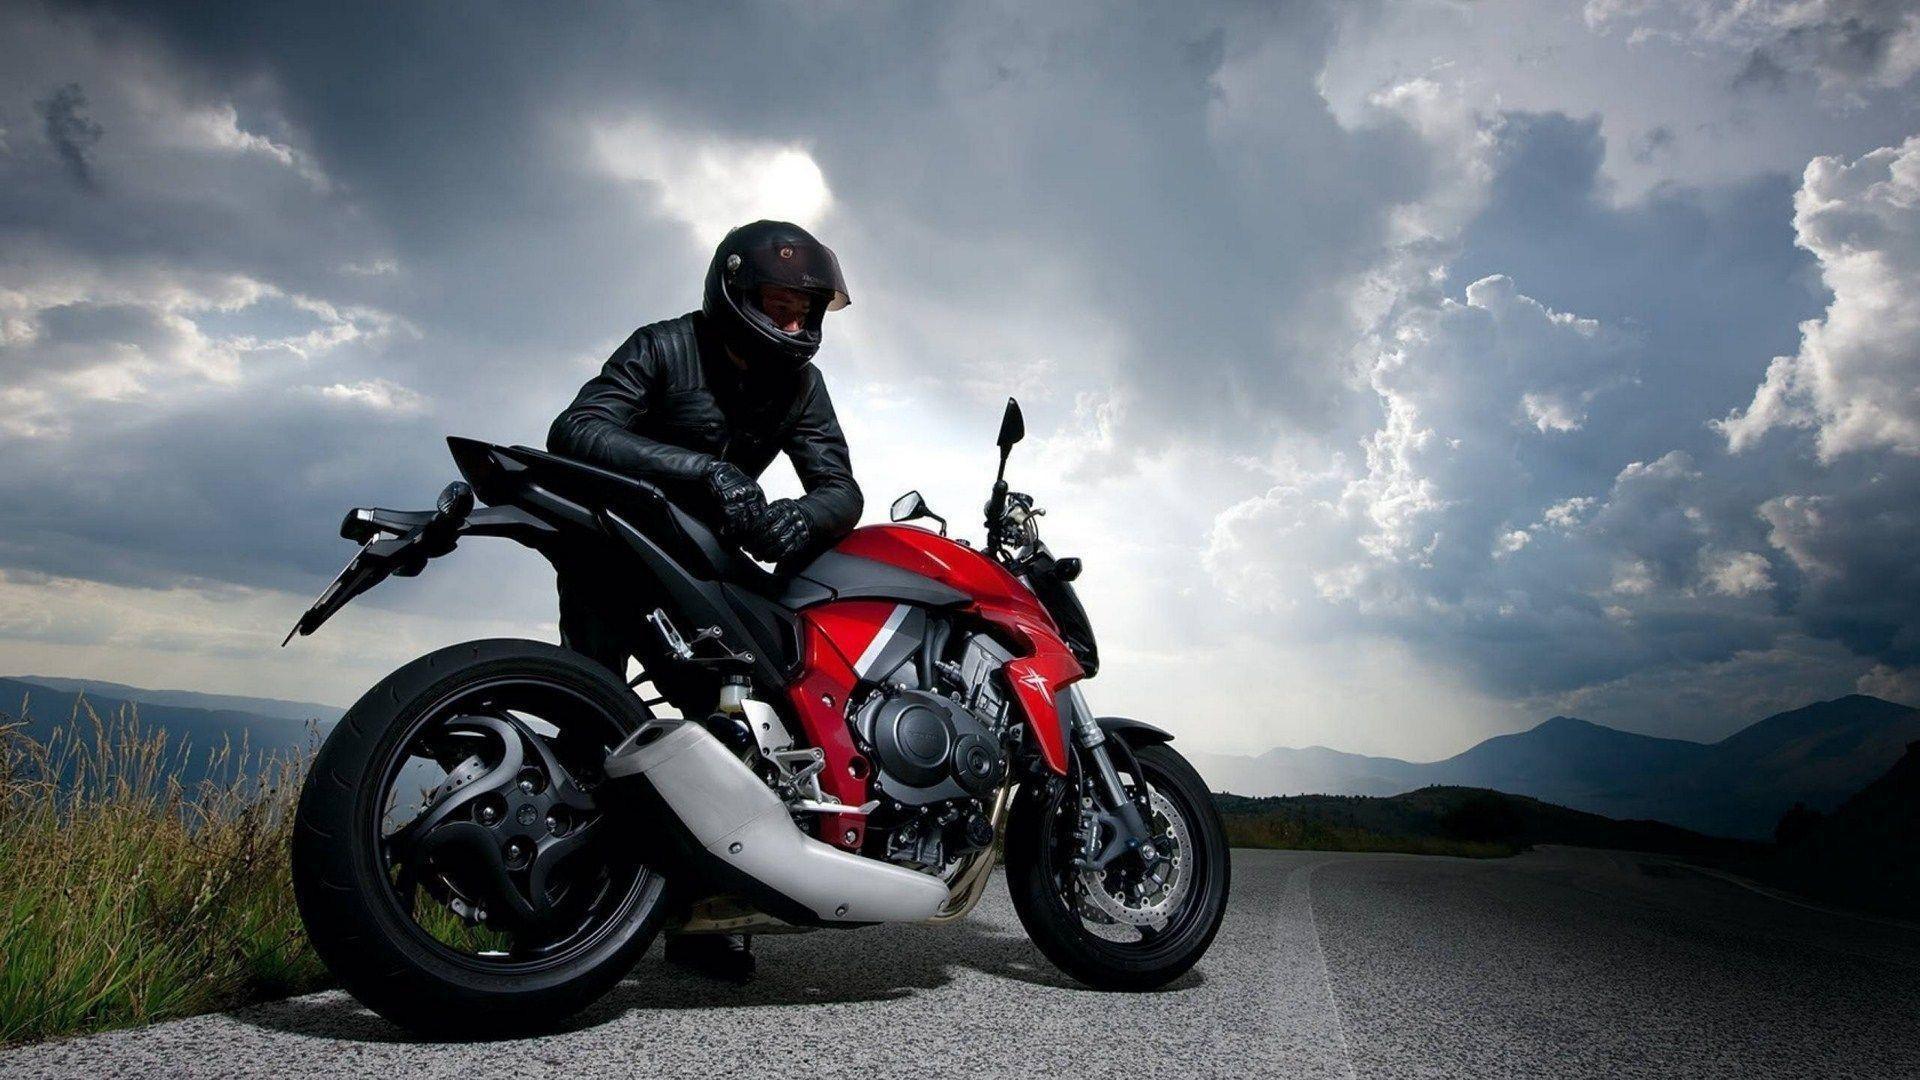 biker black suit honda cb1000r cloudy sky wide hd wallpaper – WPWide